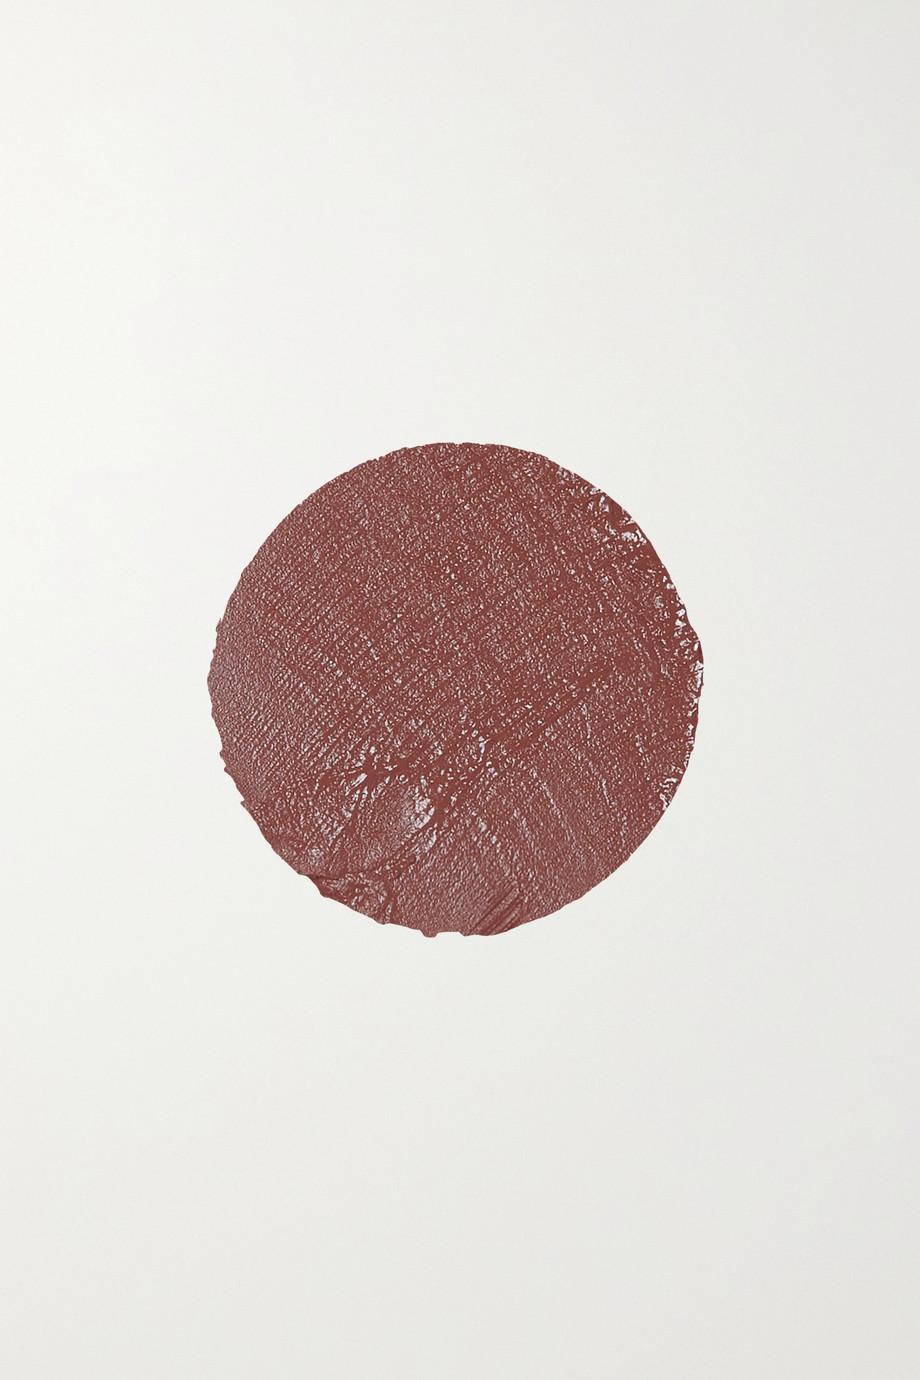 Huda Beauty Power Bullet Cream Glow Lipstick - Buttercup